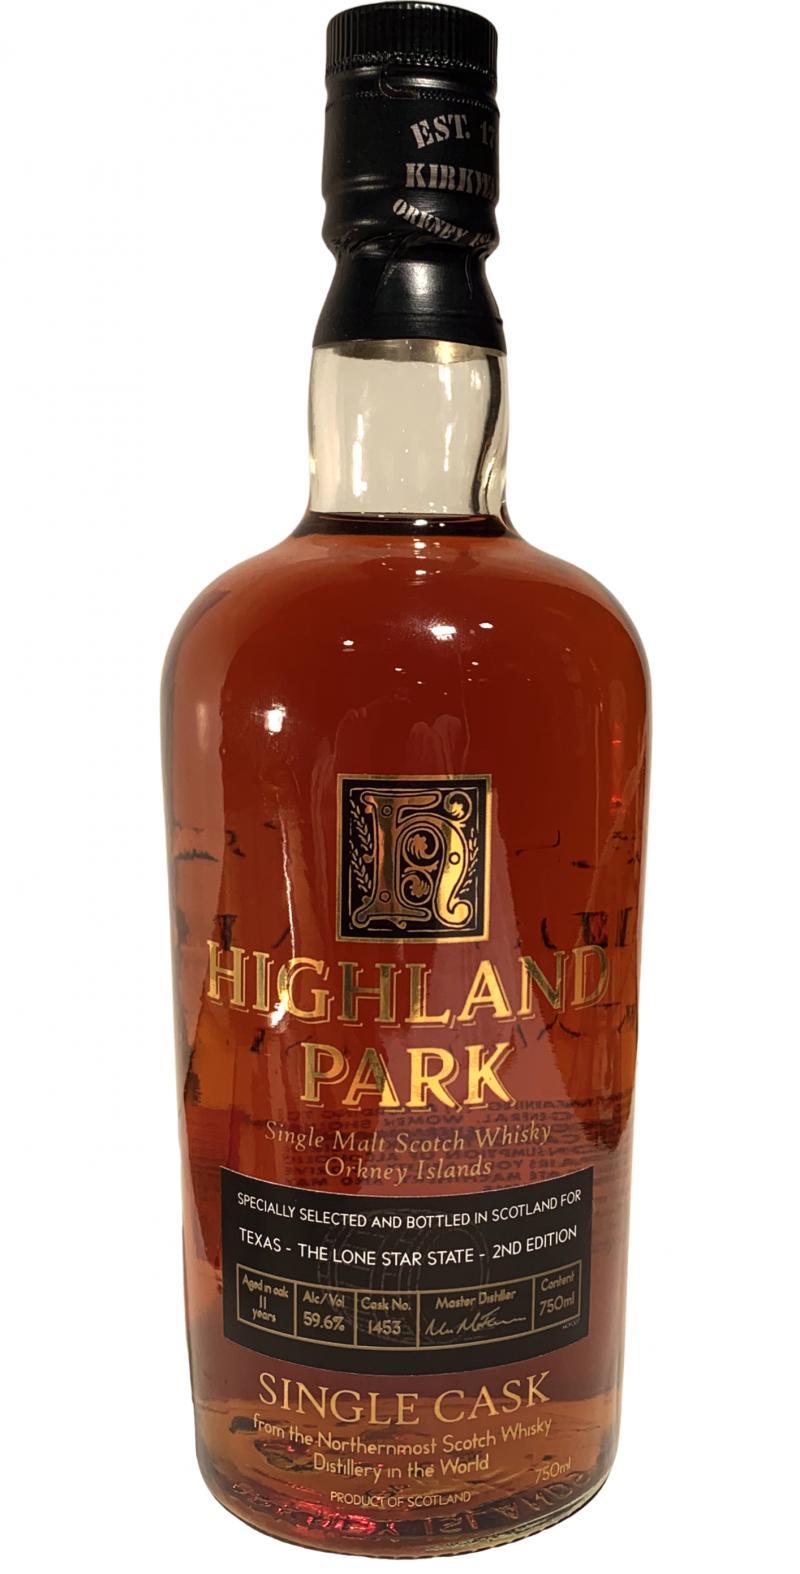 Highland Park 11-year-old Single Cask